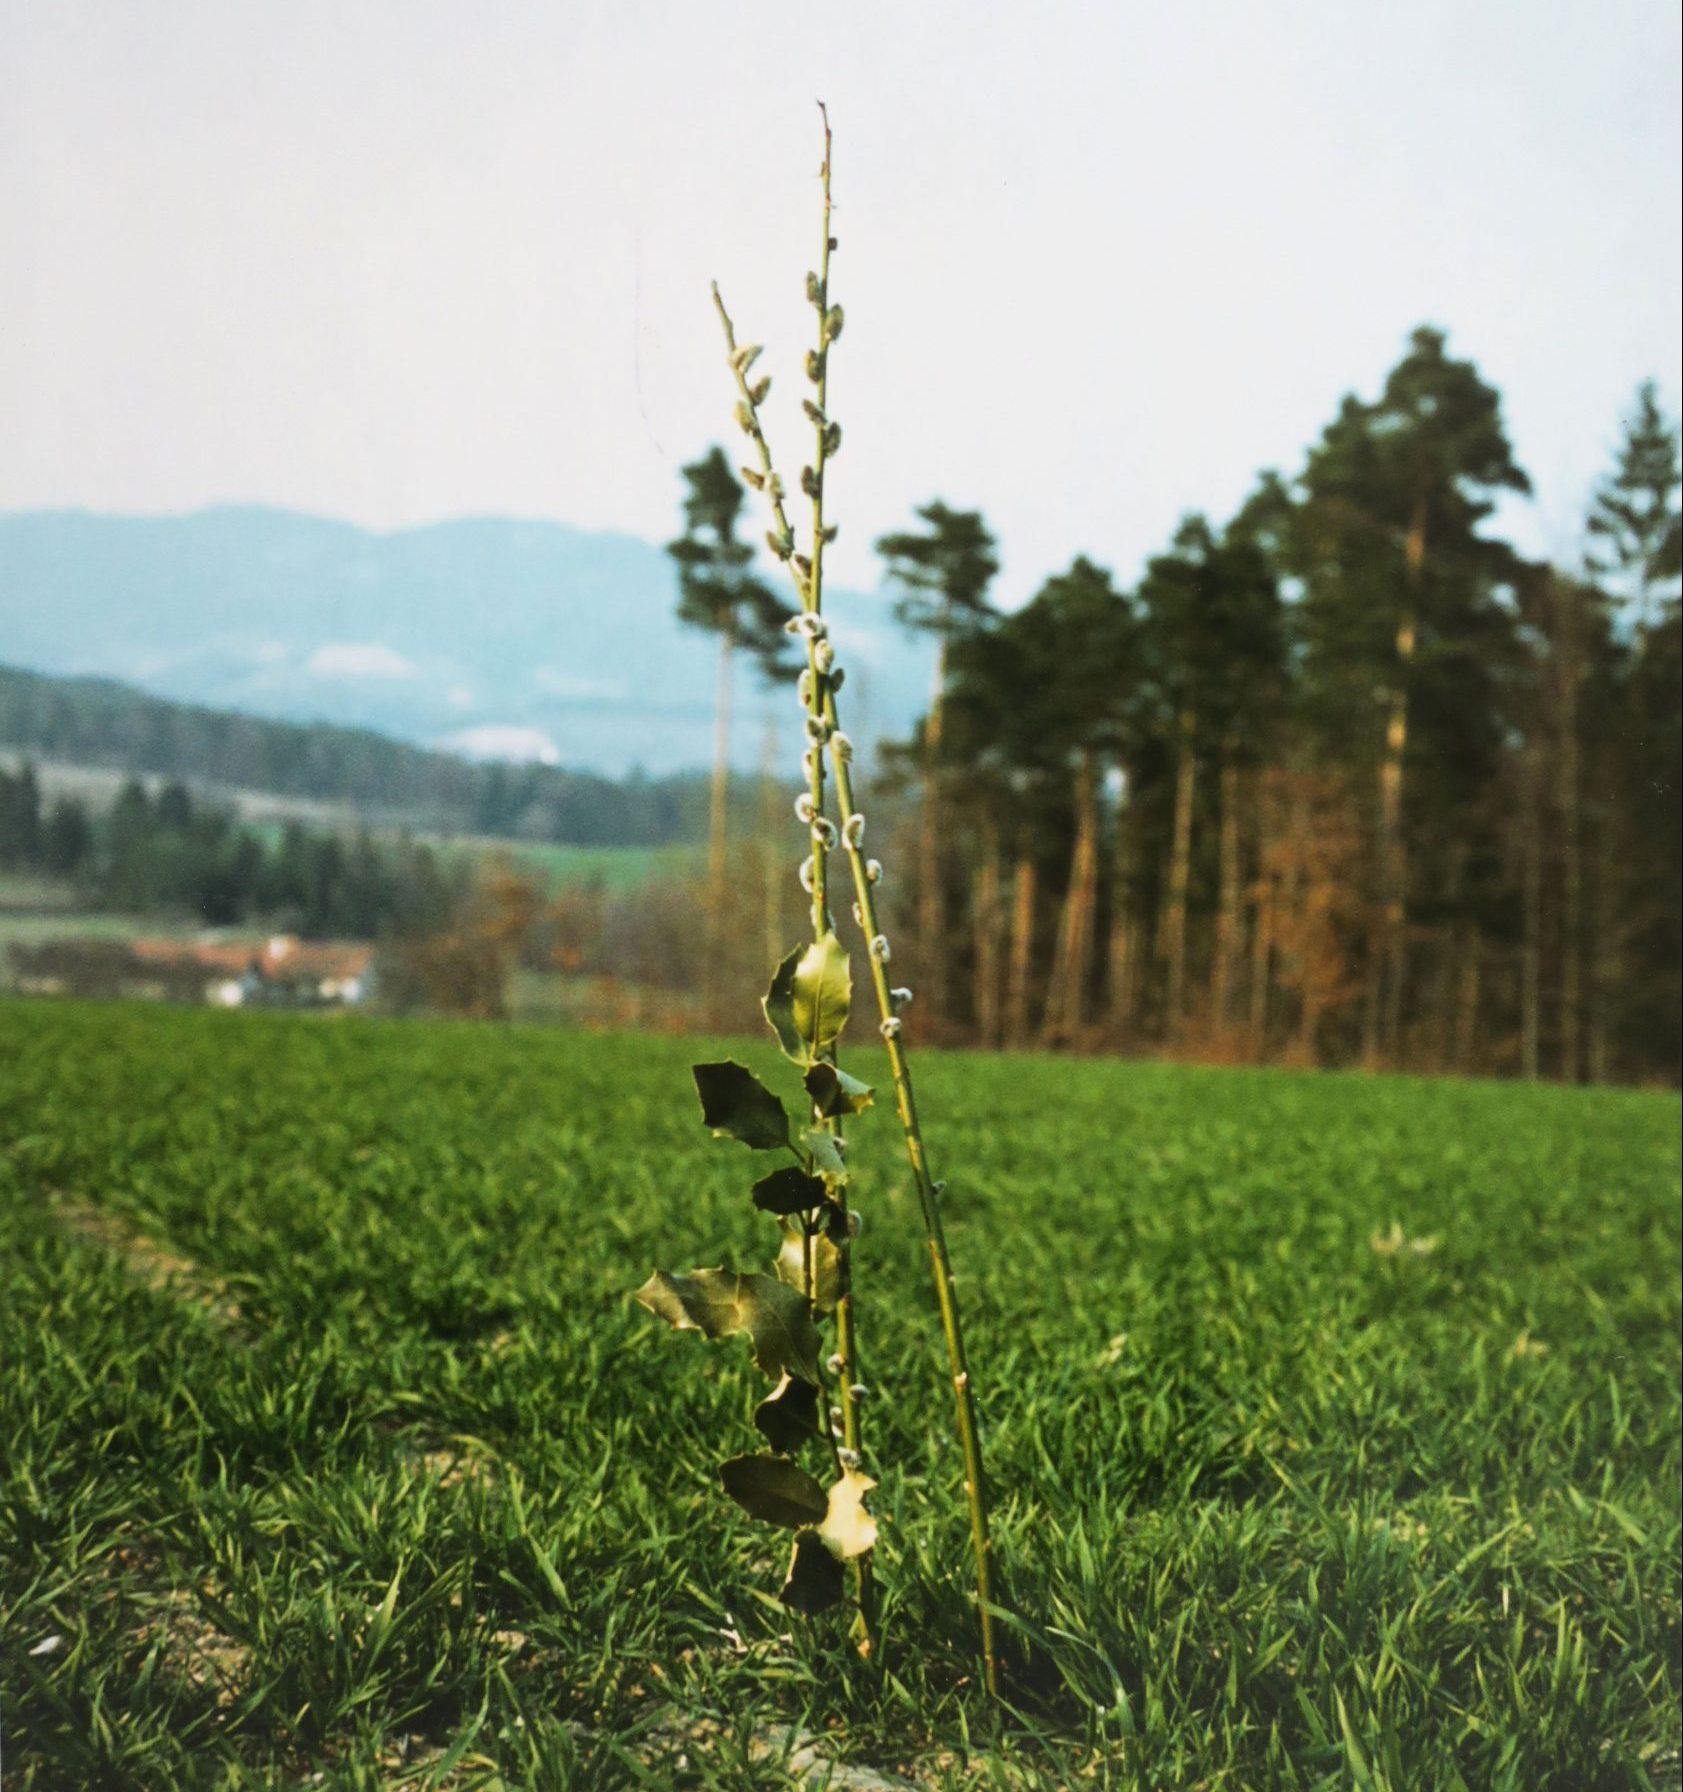 Palmzweig im Feld